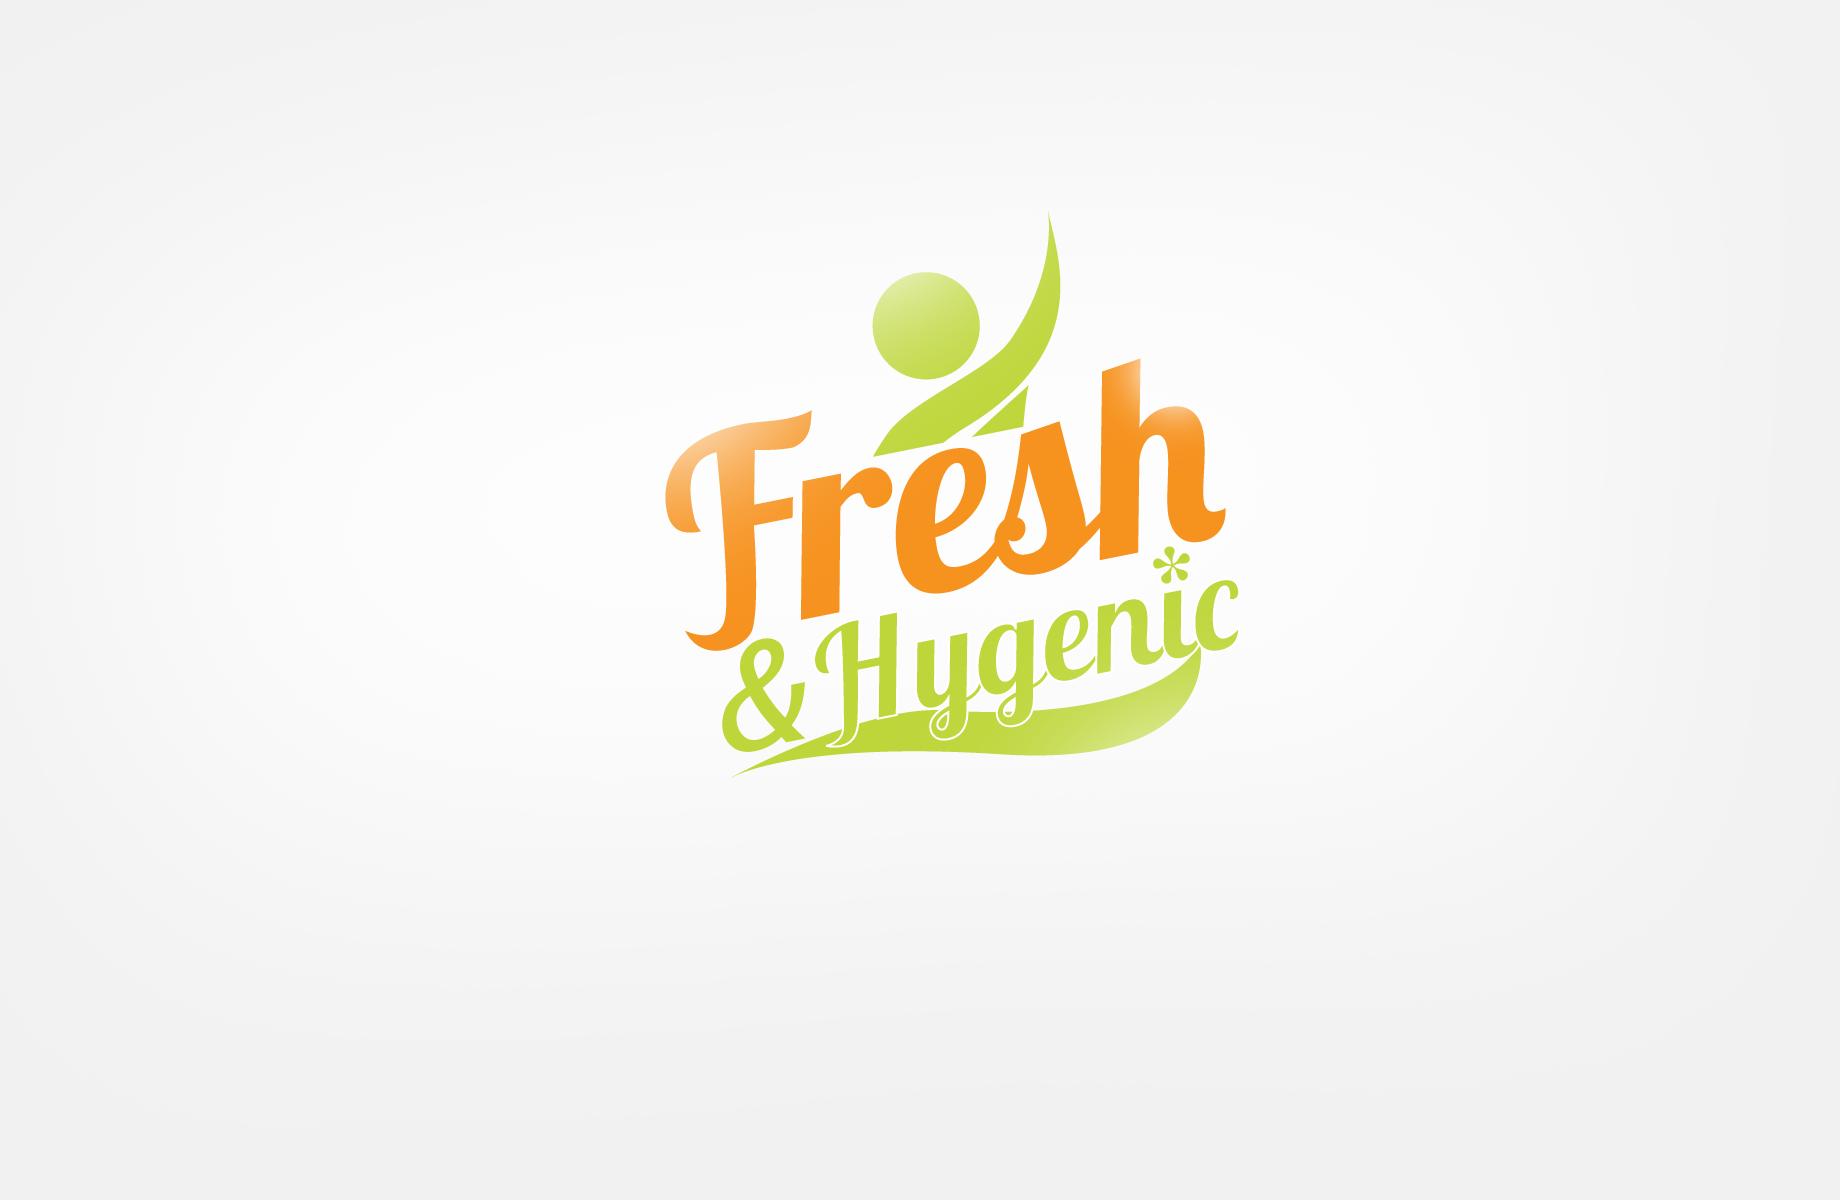 Logo Design by Jan Chua - Entry No. 71 in the Logo Design Contest Fun Logo Design for Fresh & Hygenic.